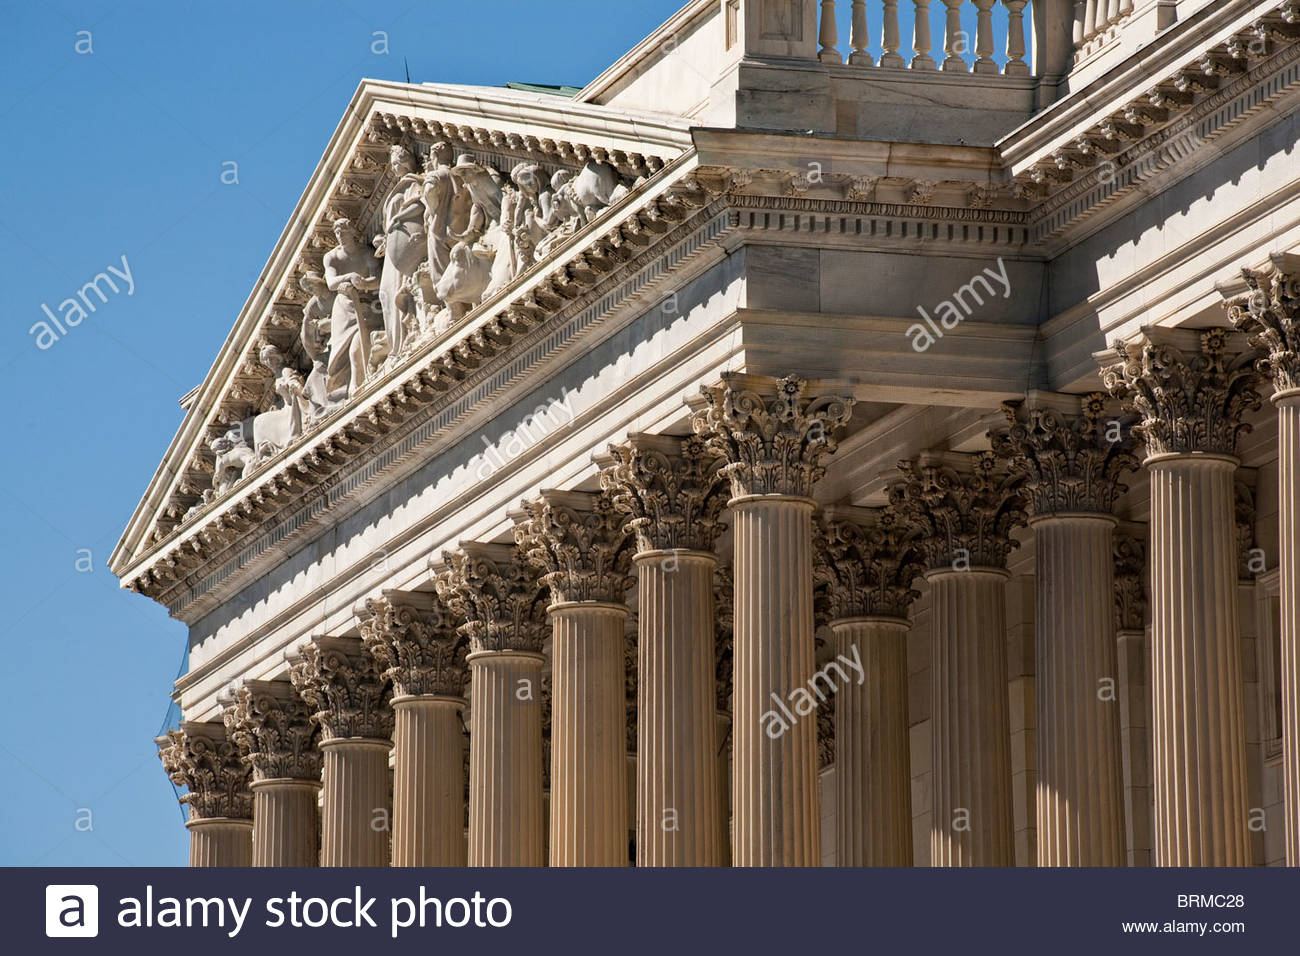 U. S. Capitol Corinthian Column and Frieze over East Facade. - Stock Image